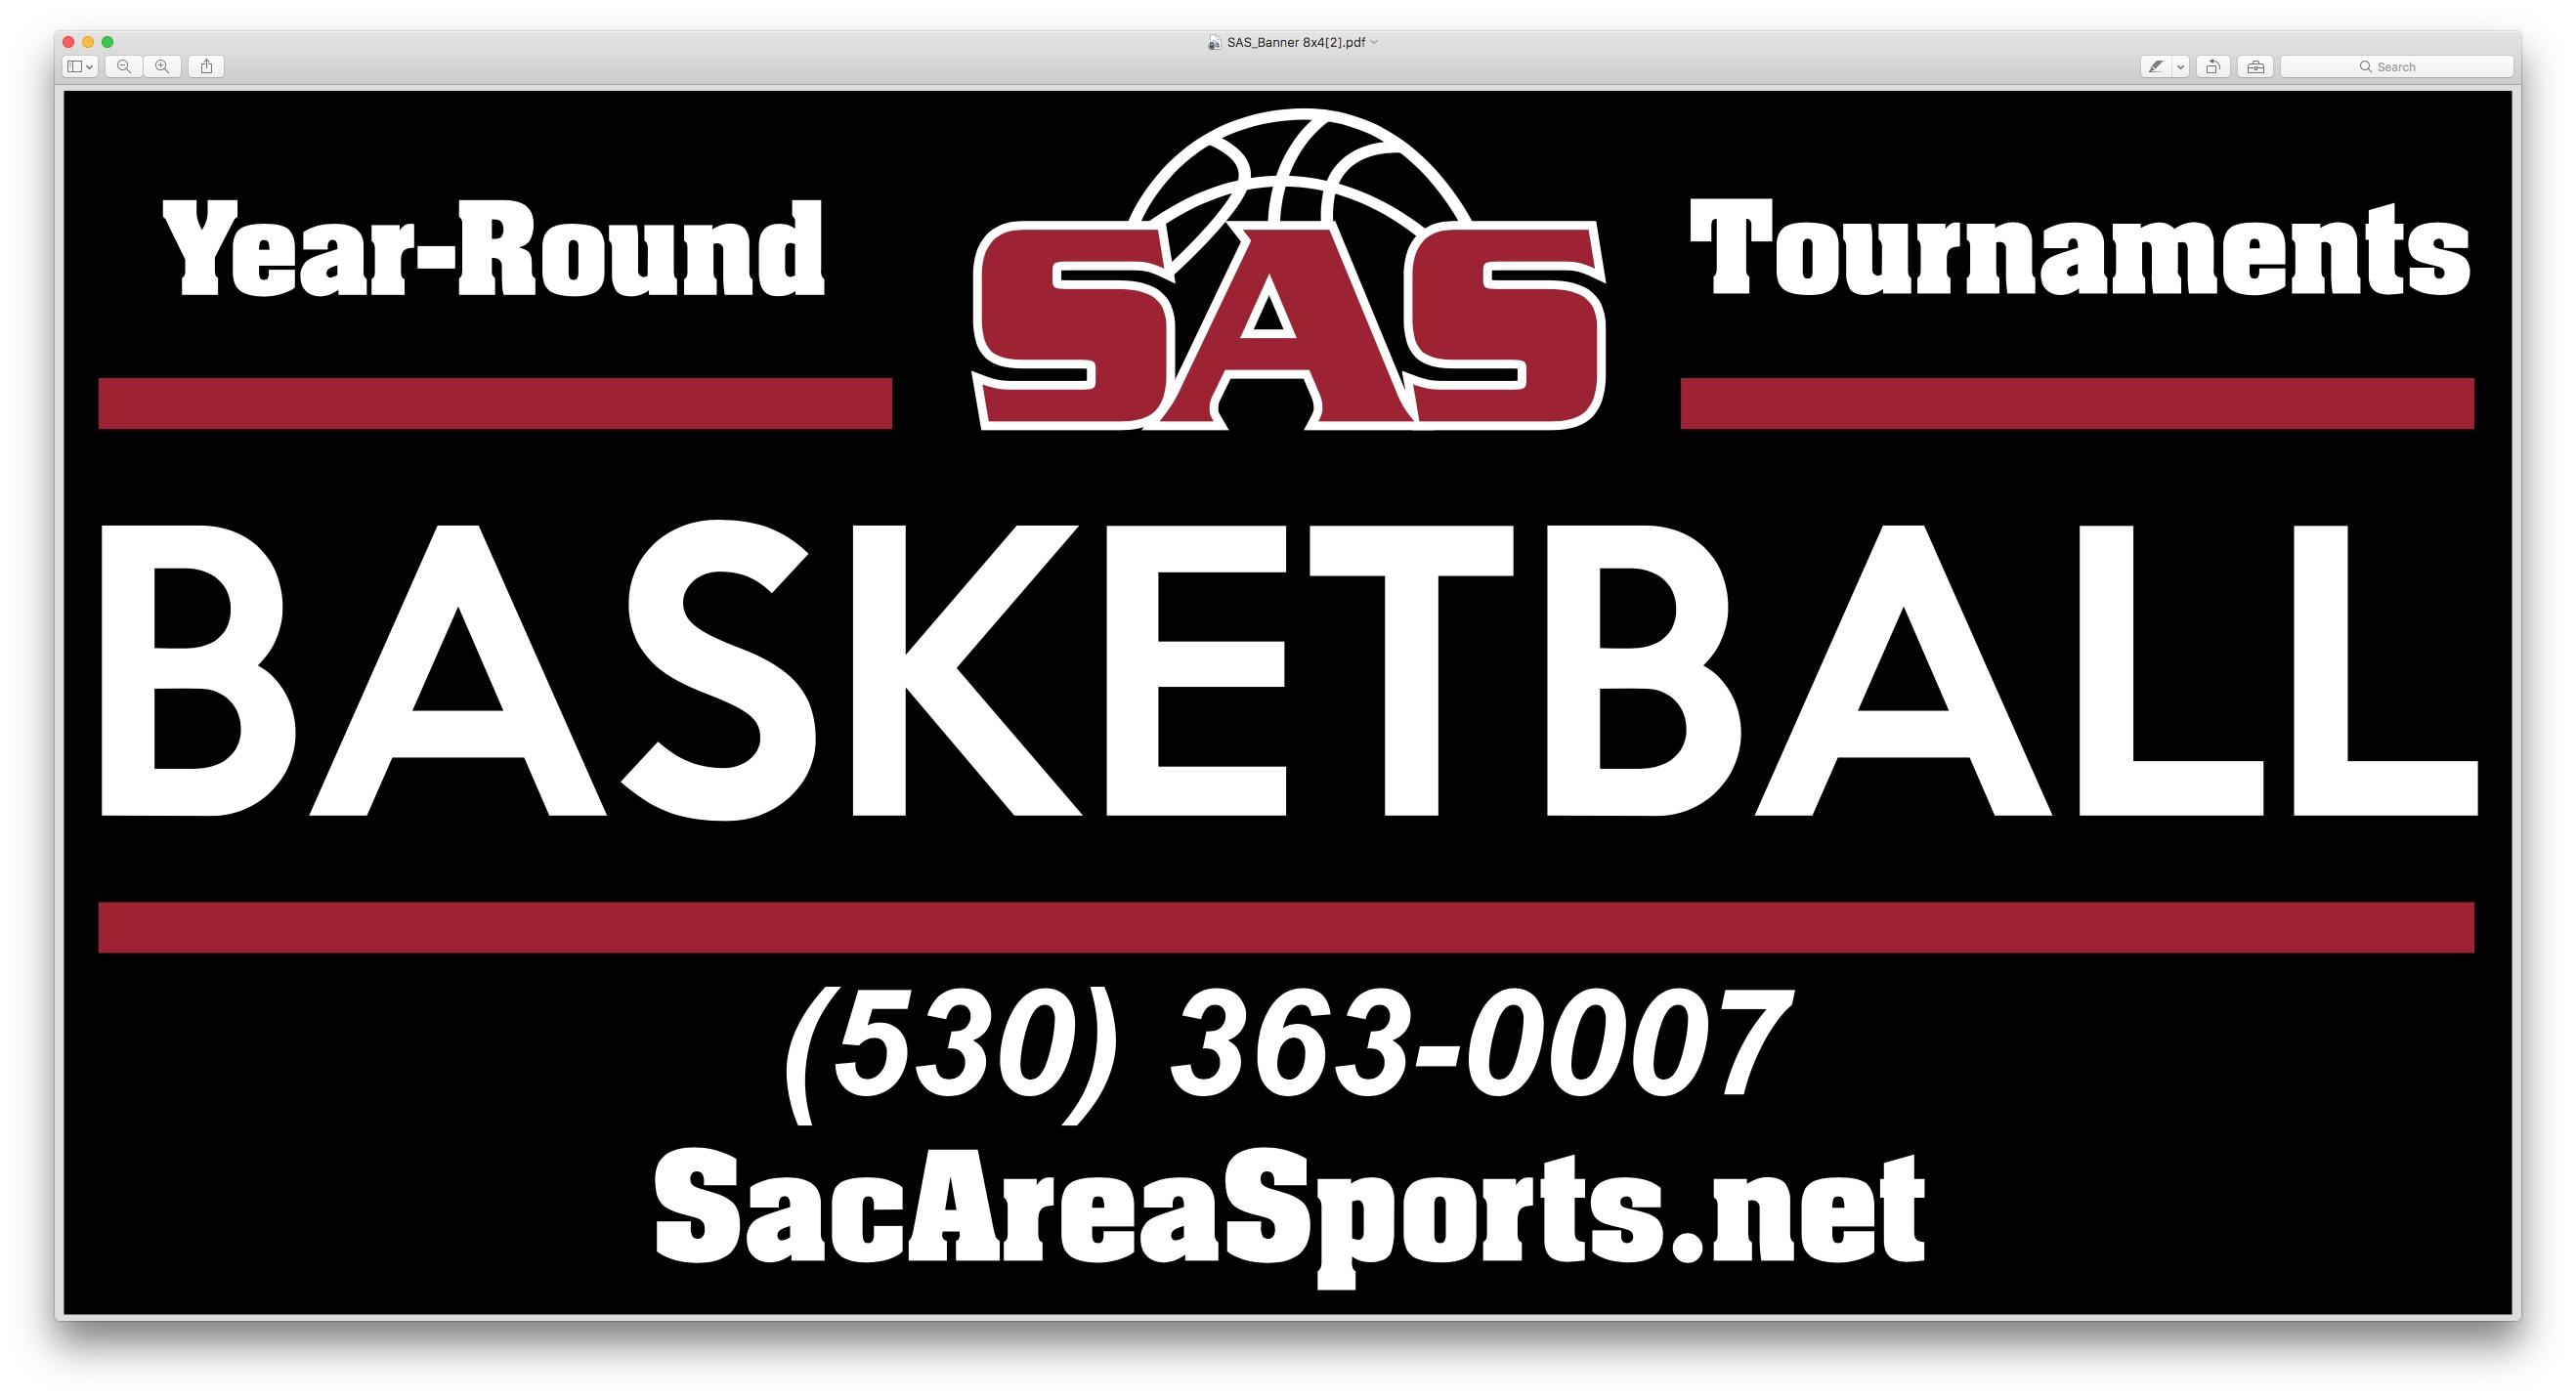 SAS Saturday Basketball Tournaments $150 per Team